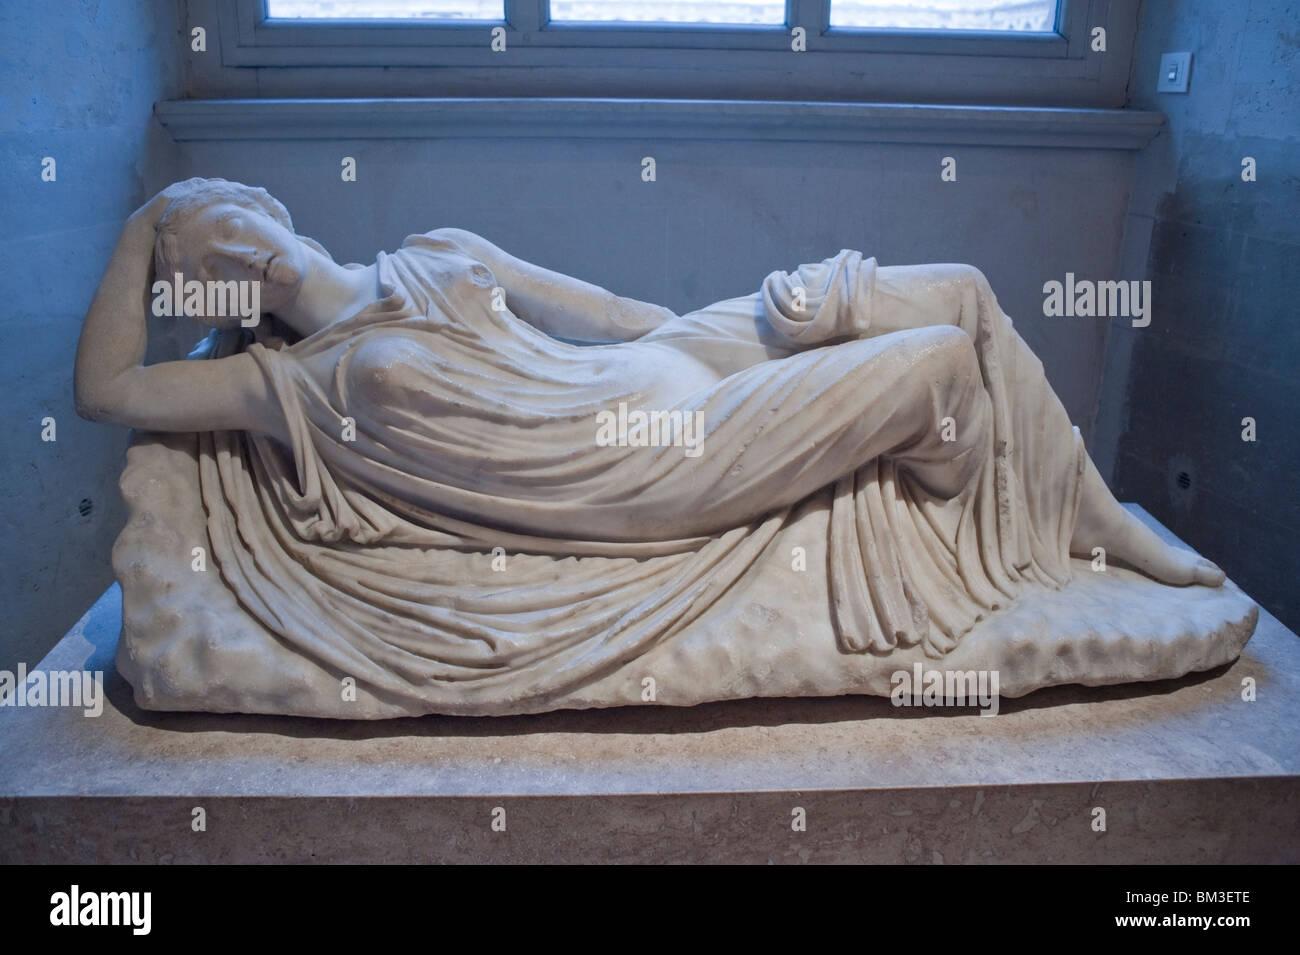 Ariane art museum date Moving Images